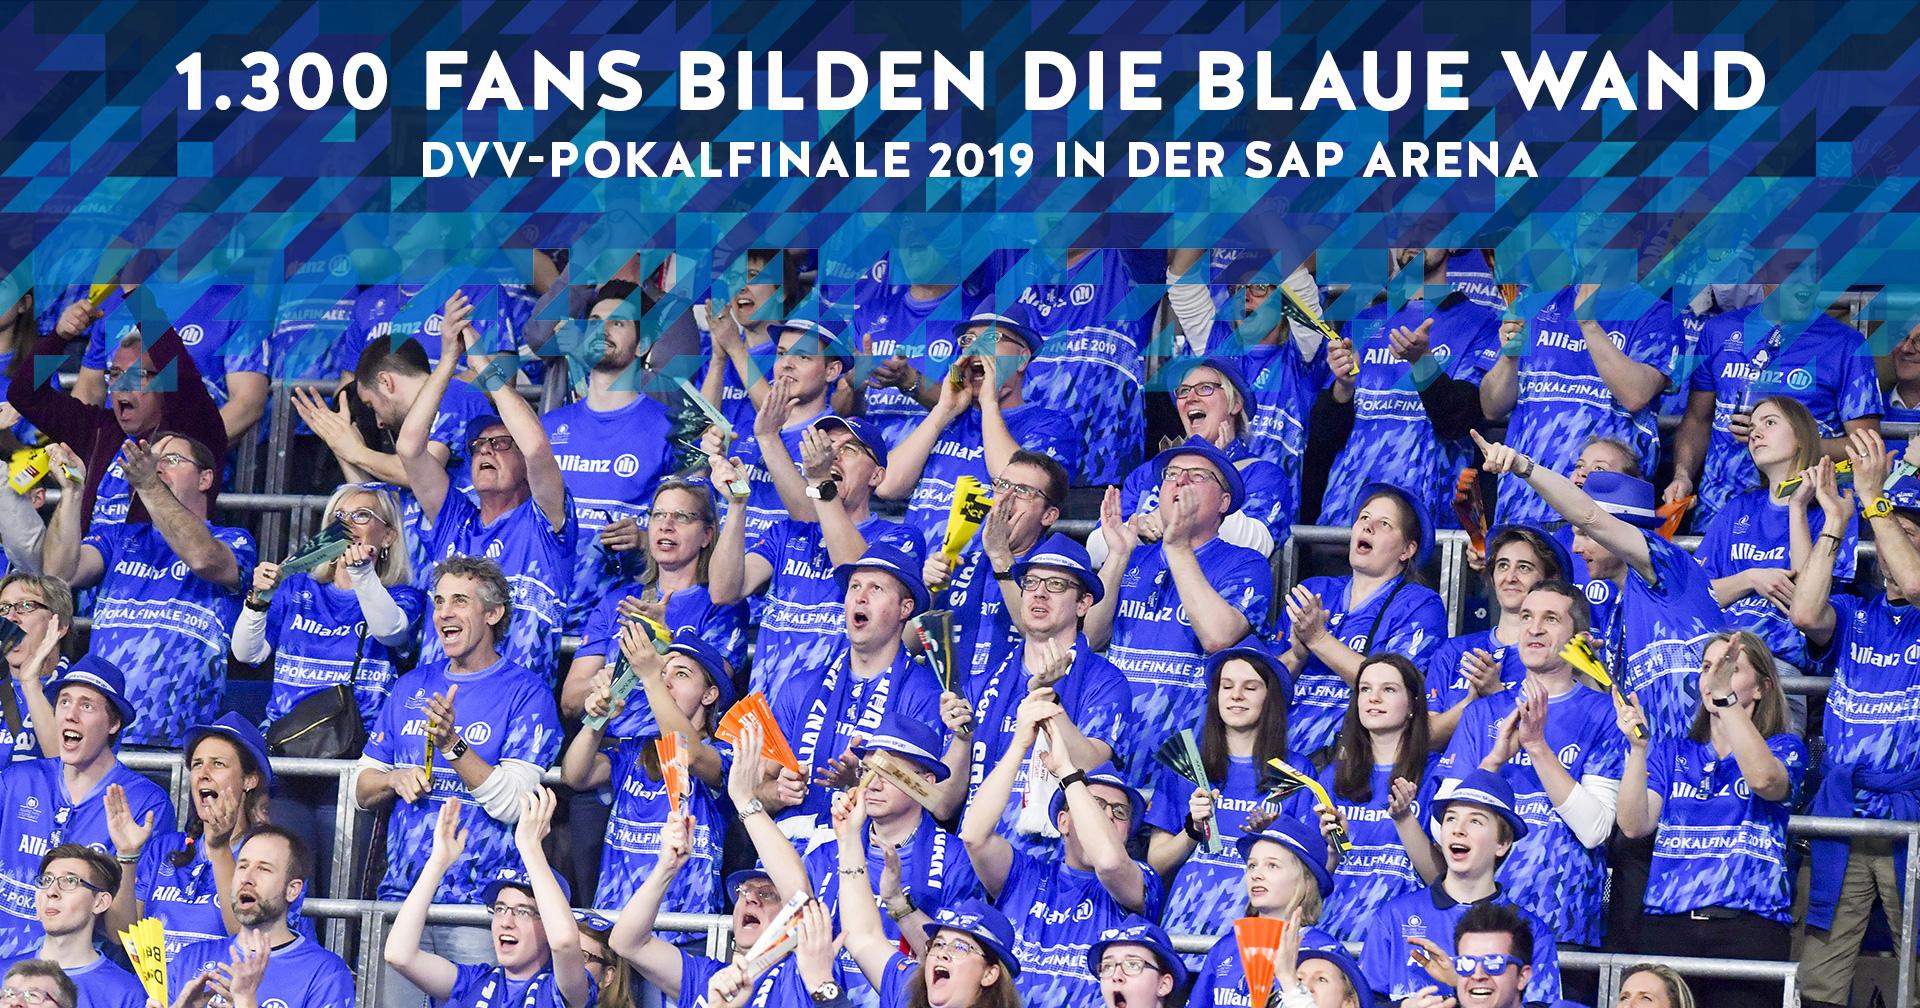 Rekord: Riesiger blauer Fanblock beim Pokalfinale